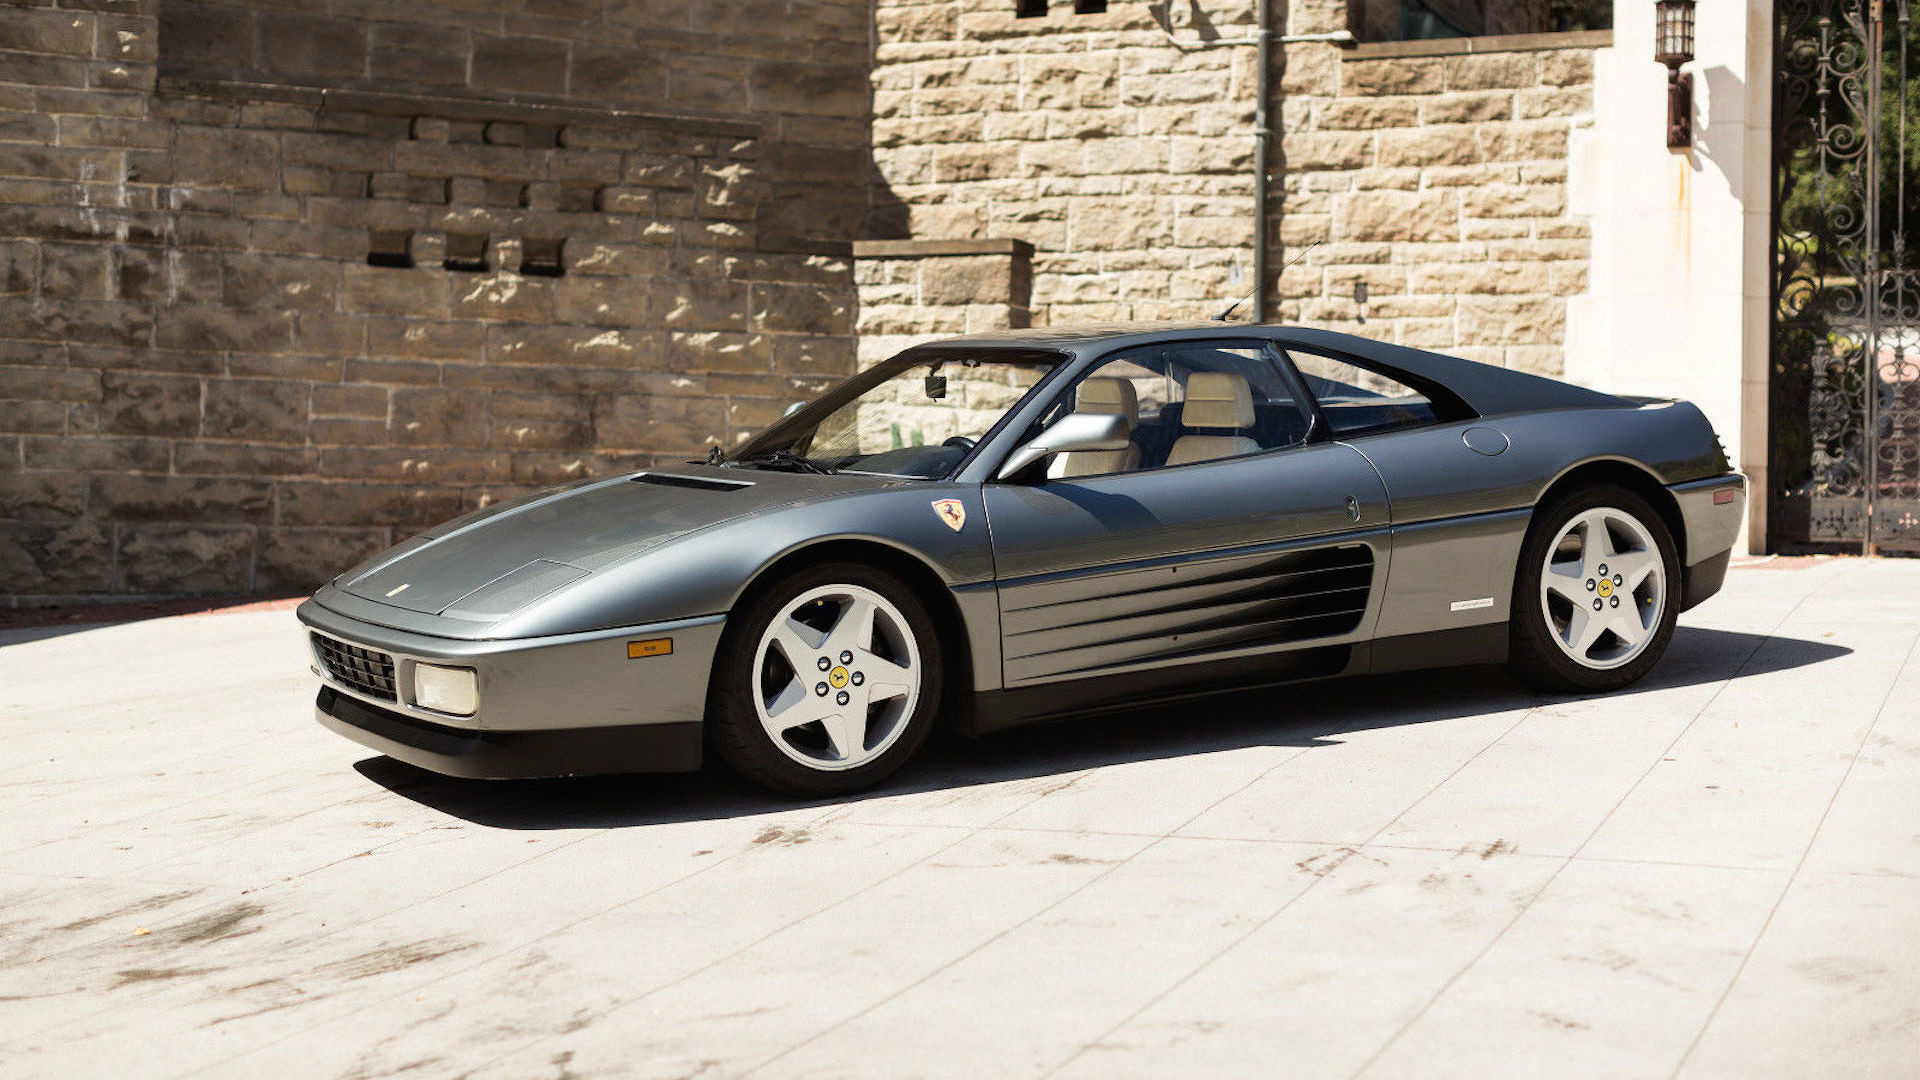 1990 Ferrari 348 eBay find more grown up in Grigio